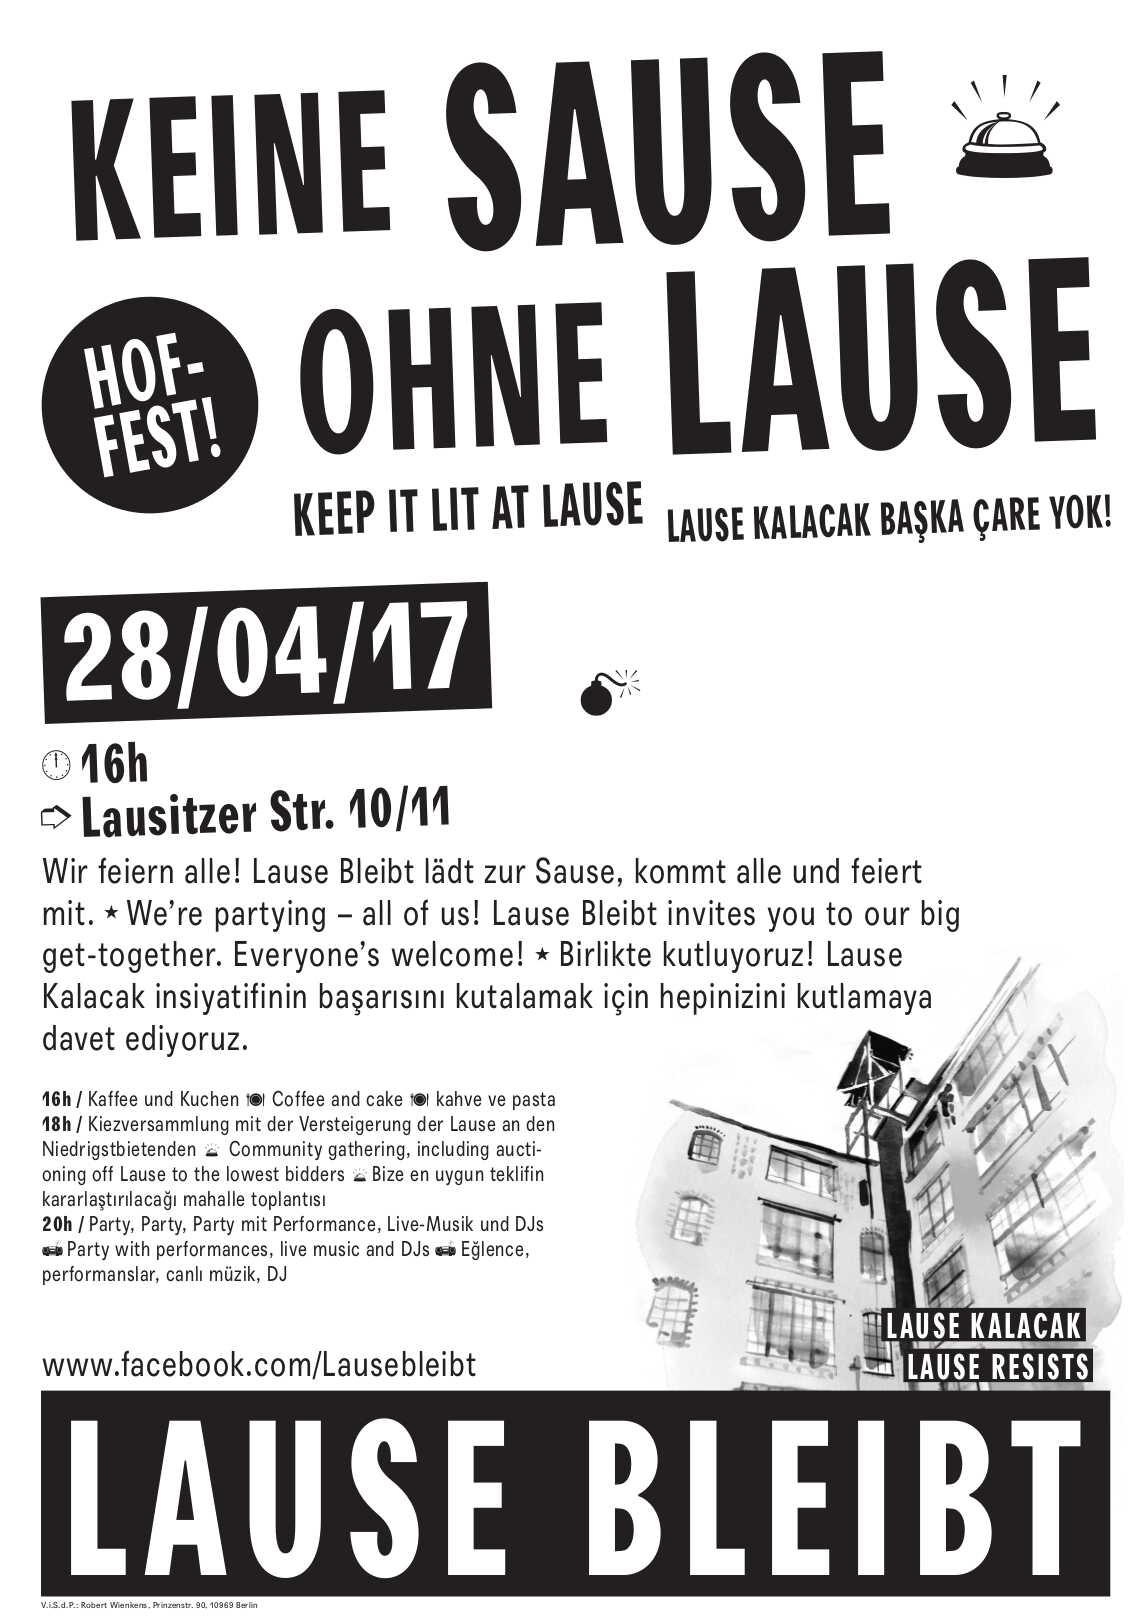 Lausebleibt Hoffest2017 Jpeg